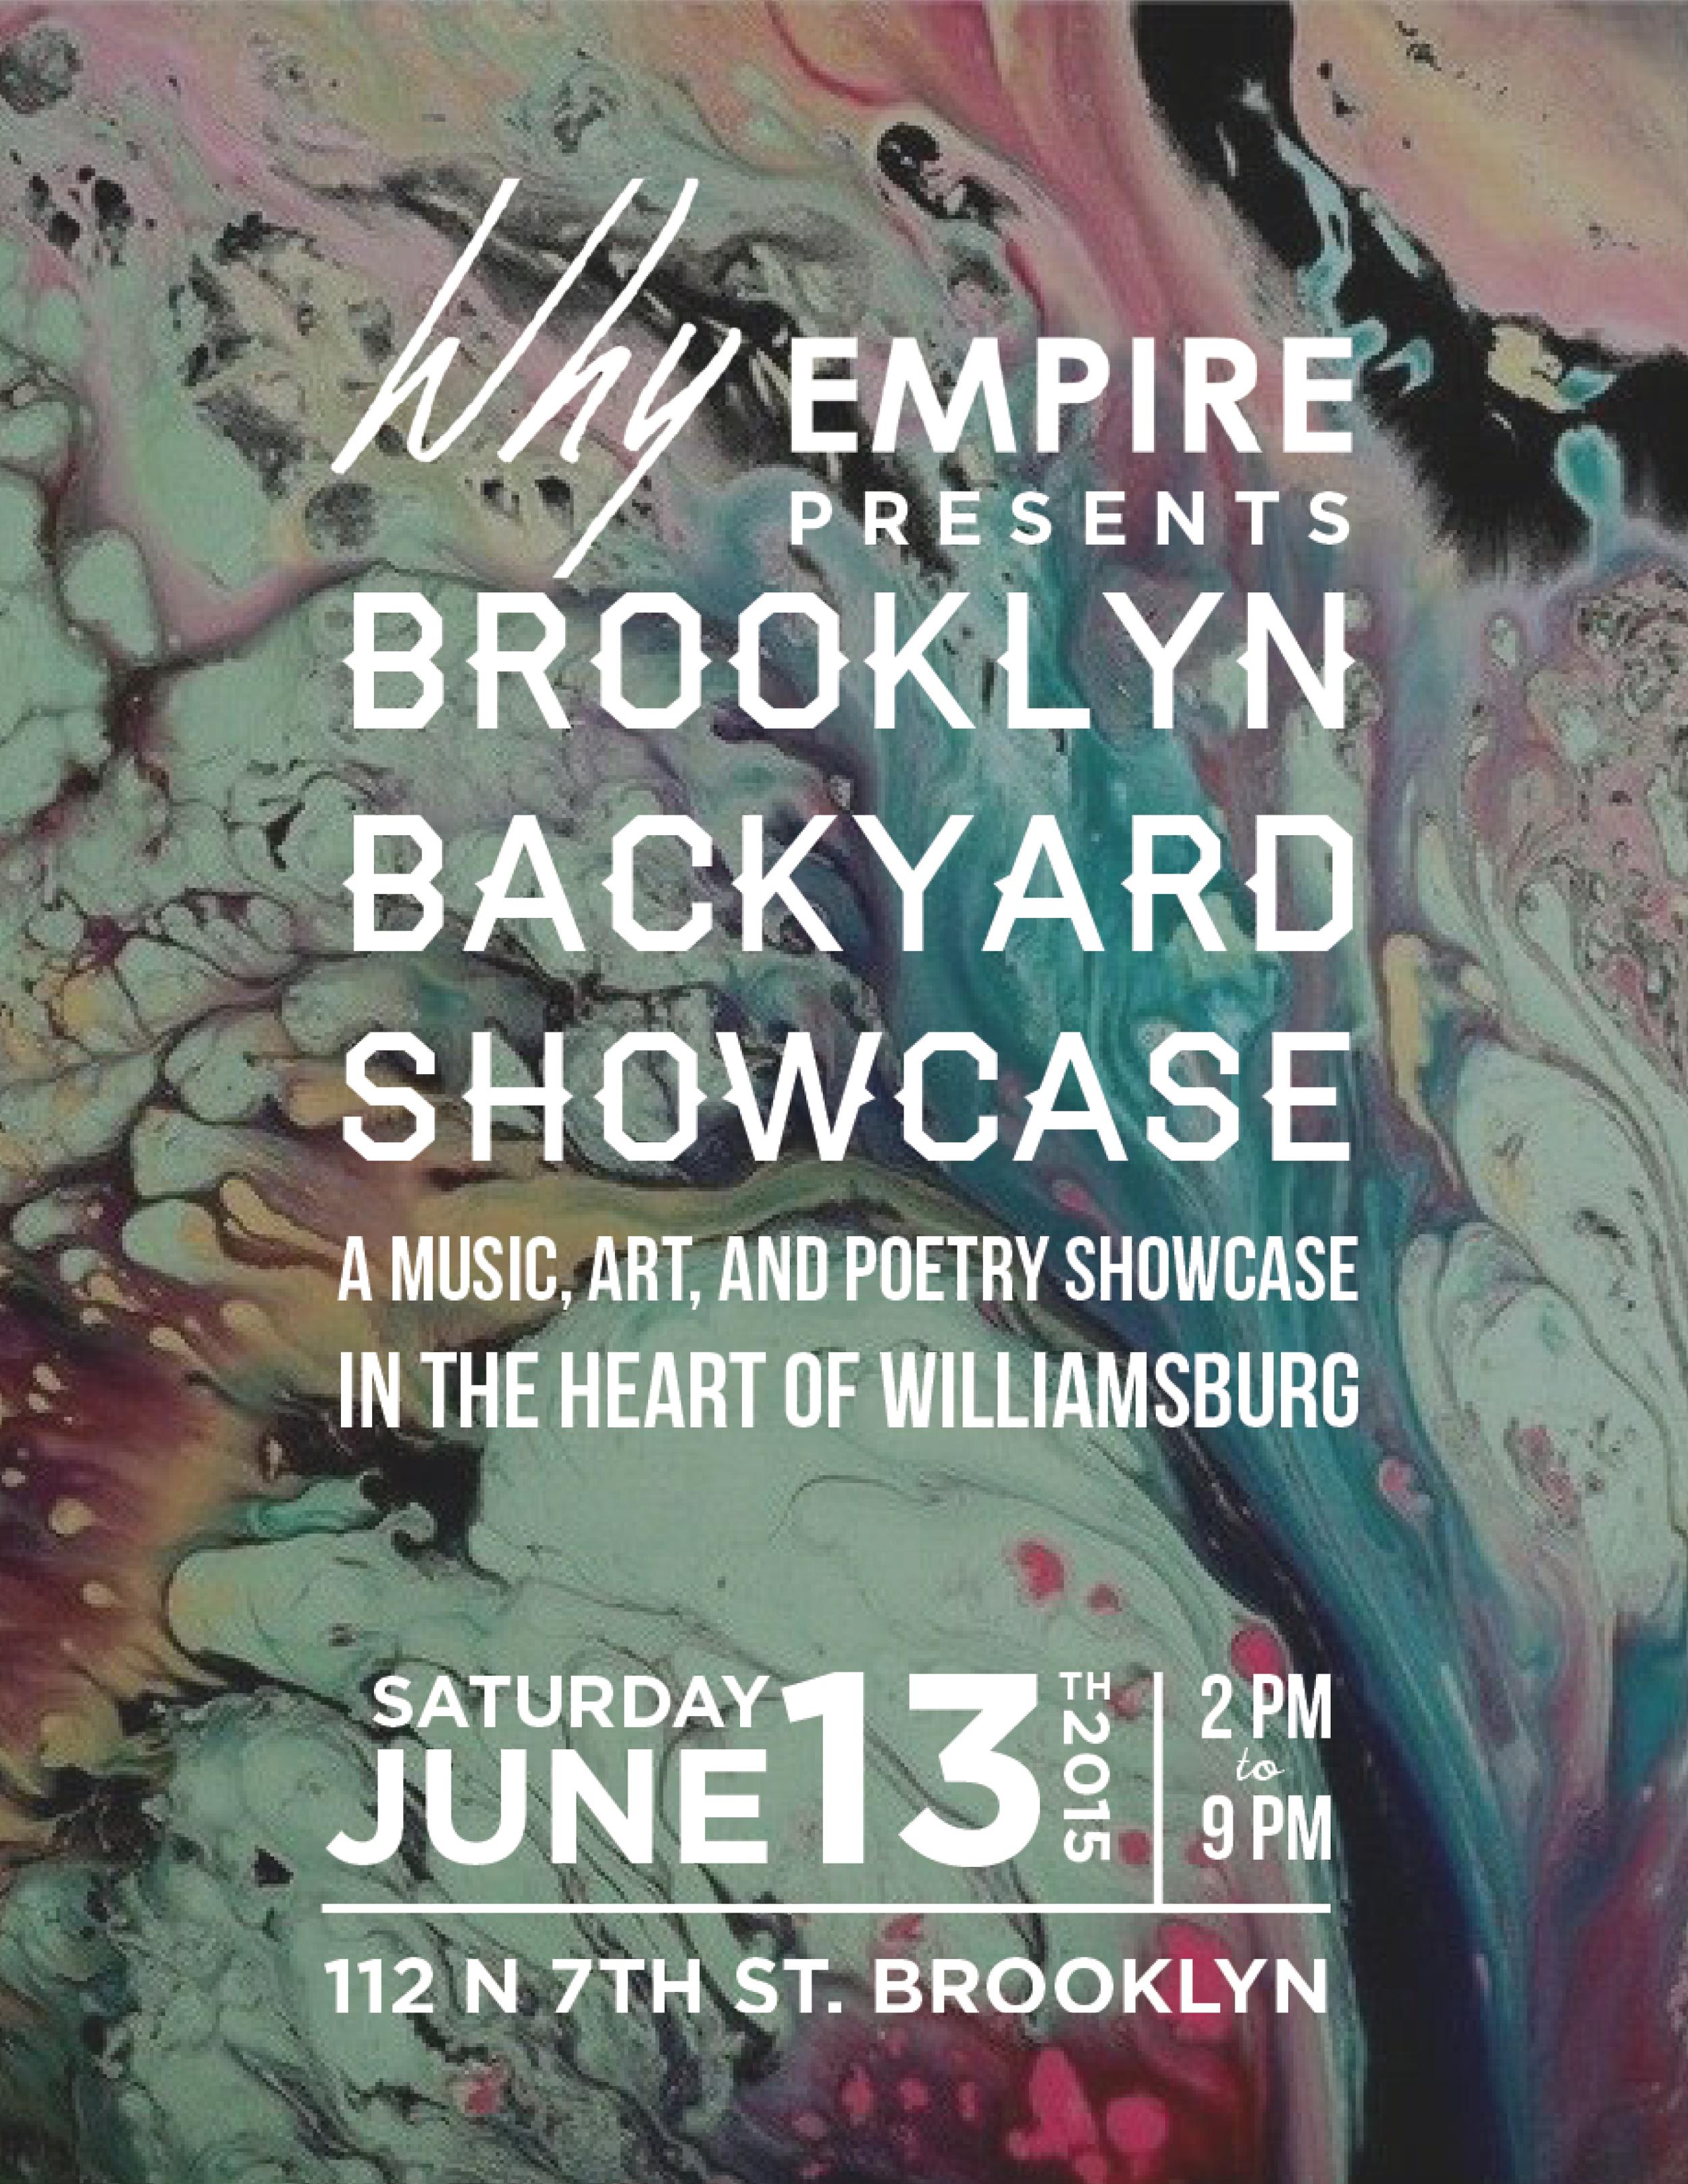 Where Brooklyn at?